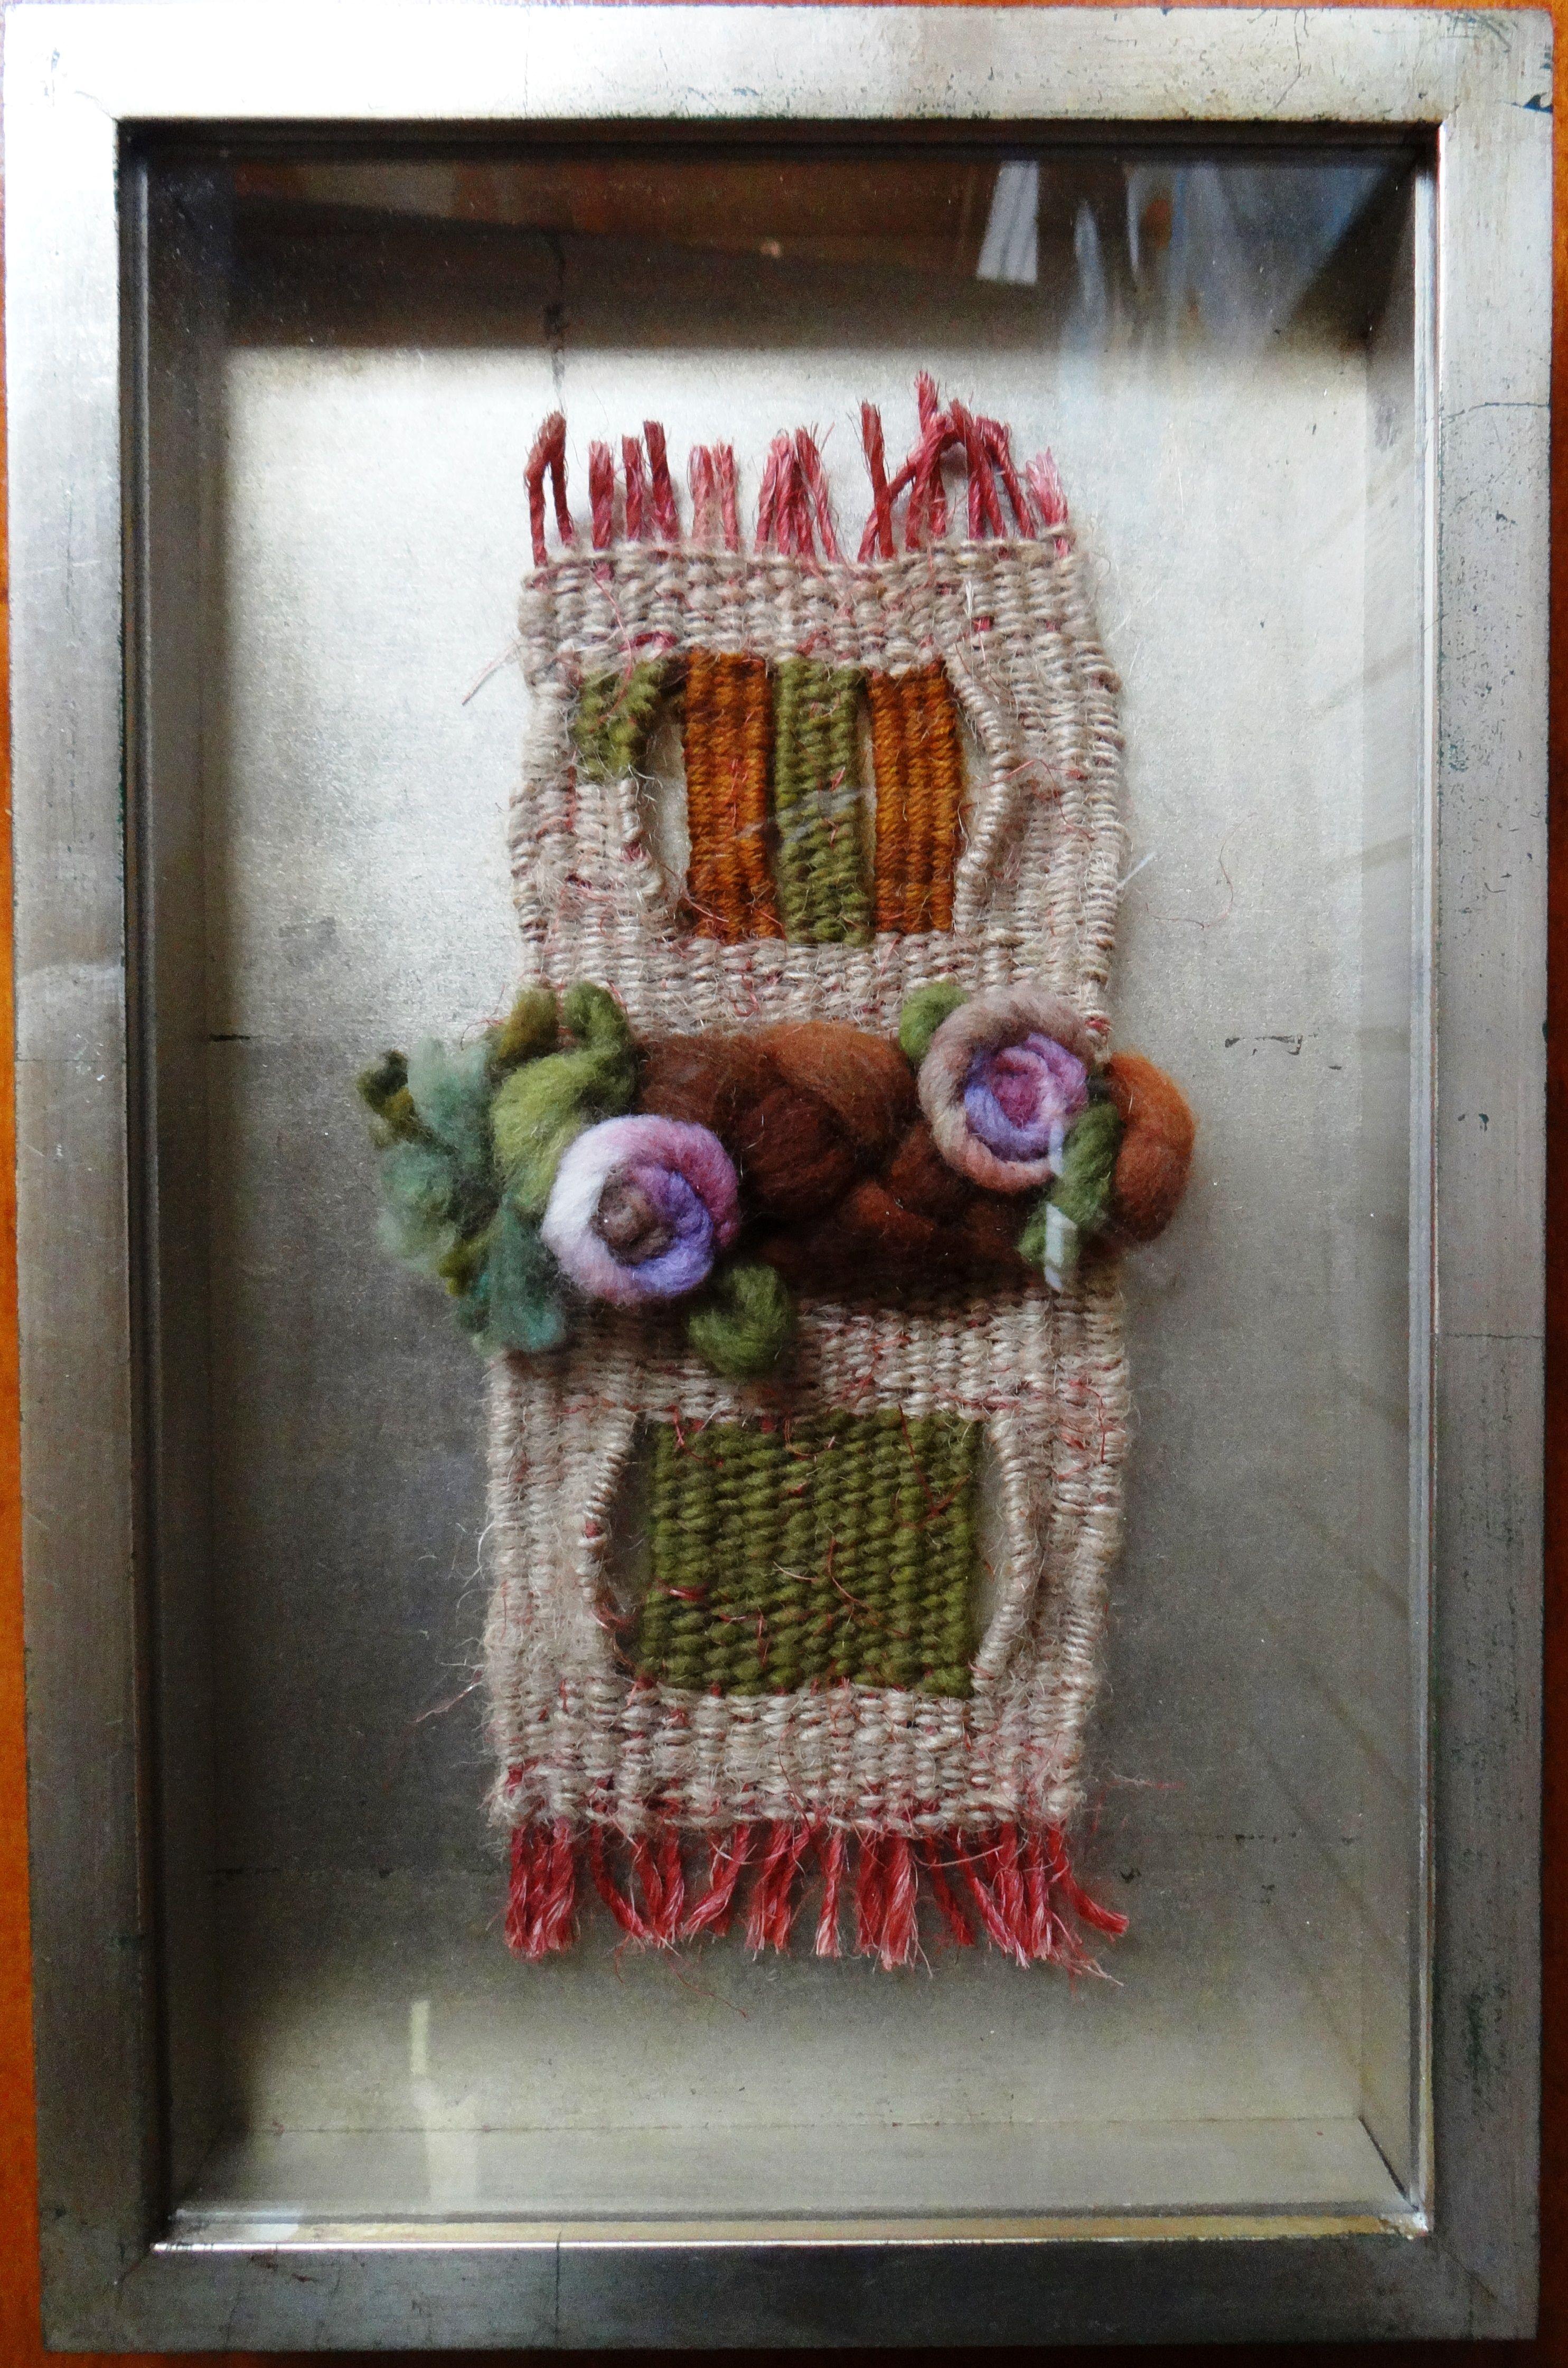 Textil a telar, marco madera con lámina de plata, cubierta de vidrio. 40 cms x 26 cms